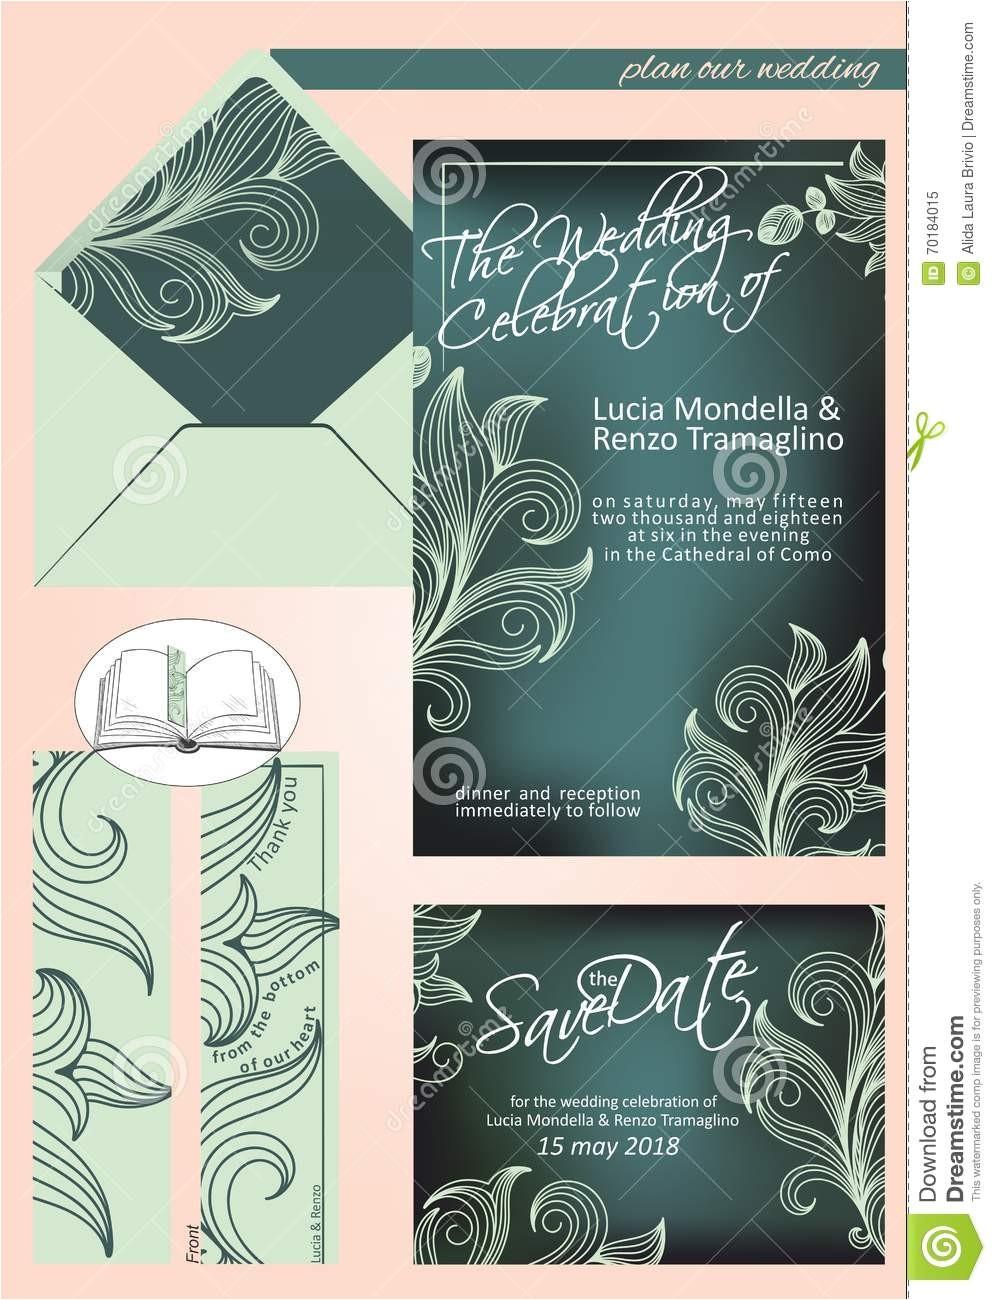 elegant wedding invitation in shades of dark green and li